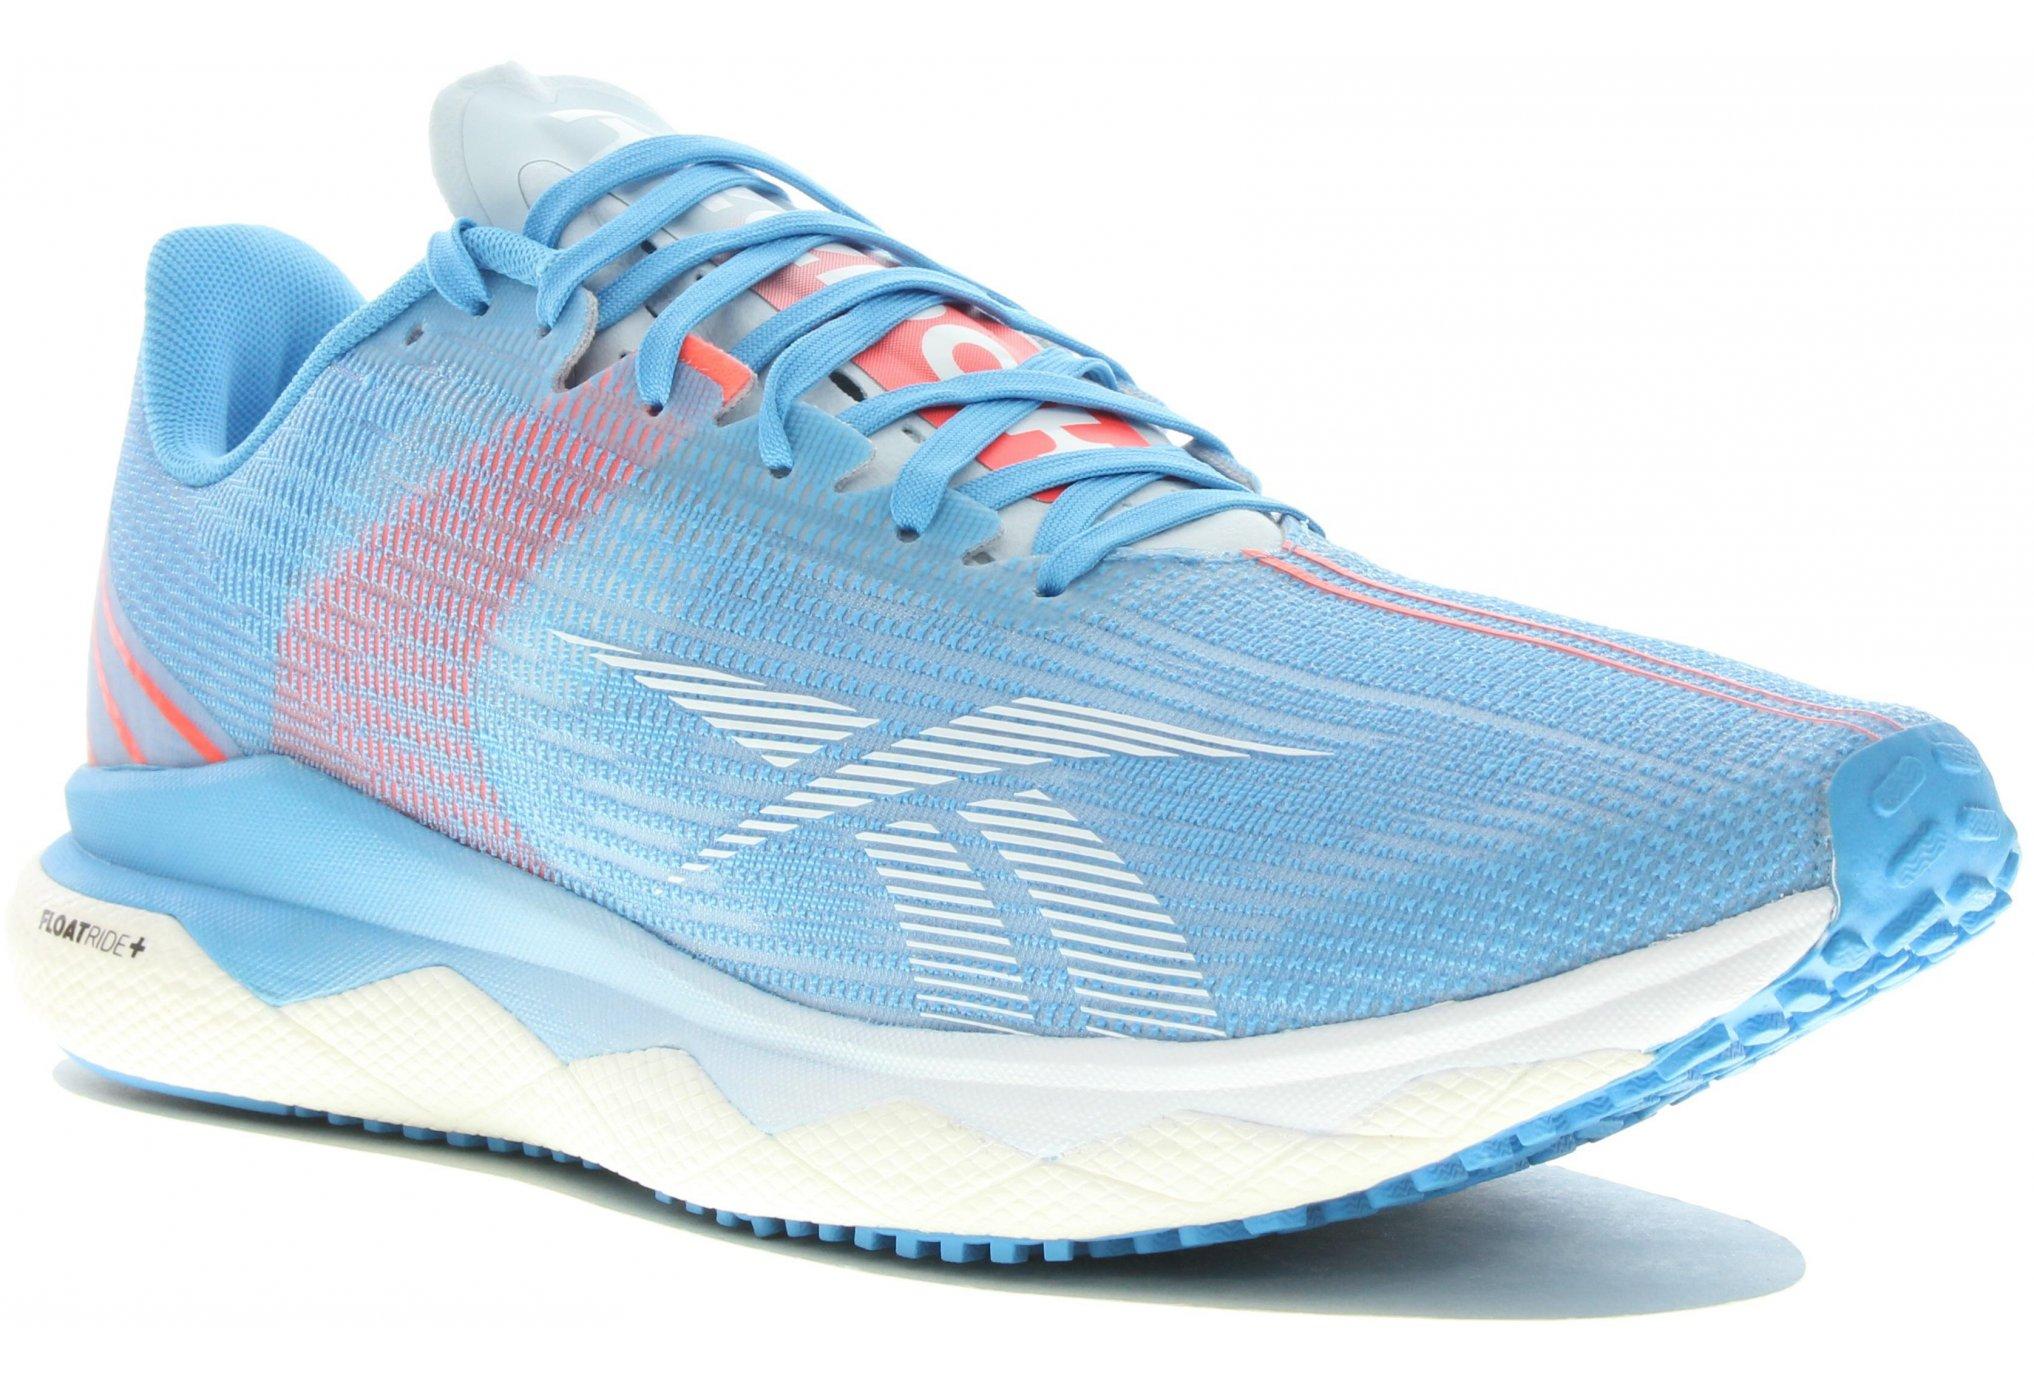 Reebok Floatride Run Fast 3.0 W Chaussures running femme